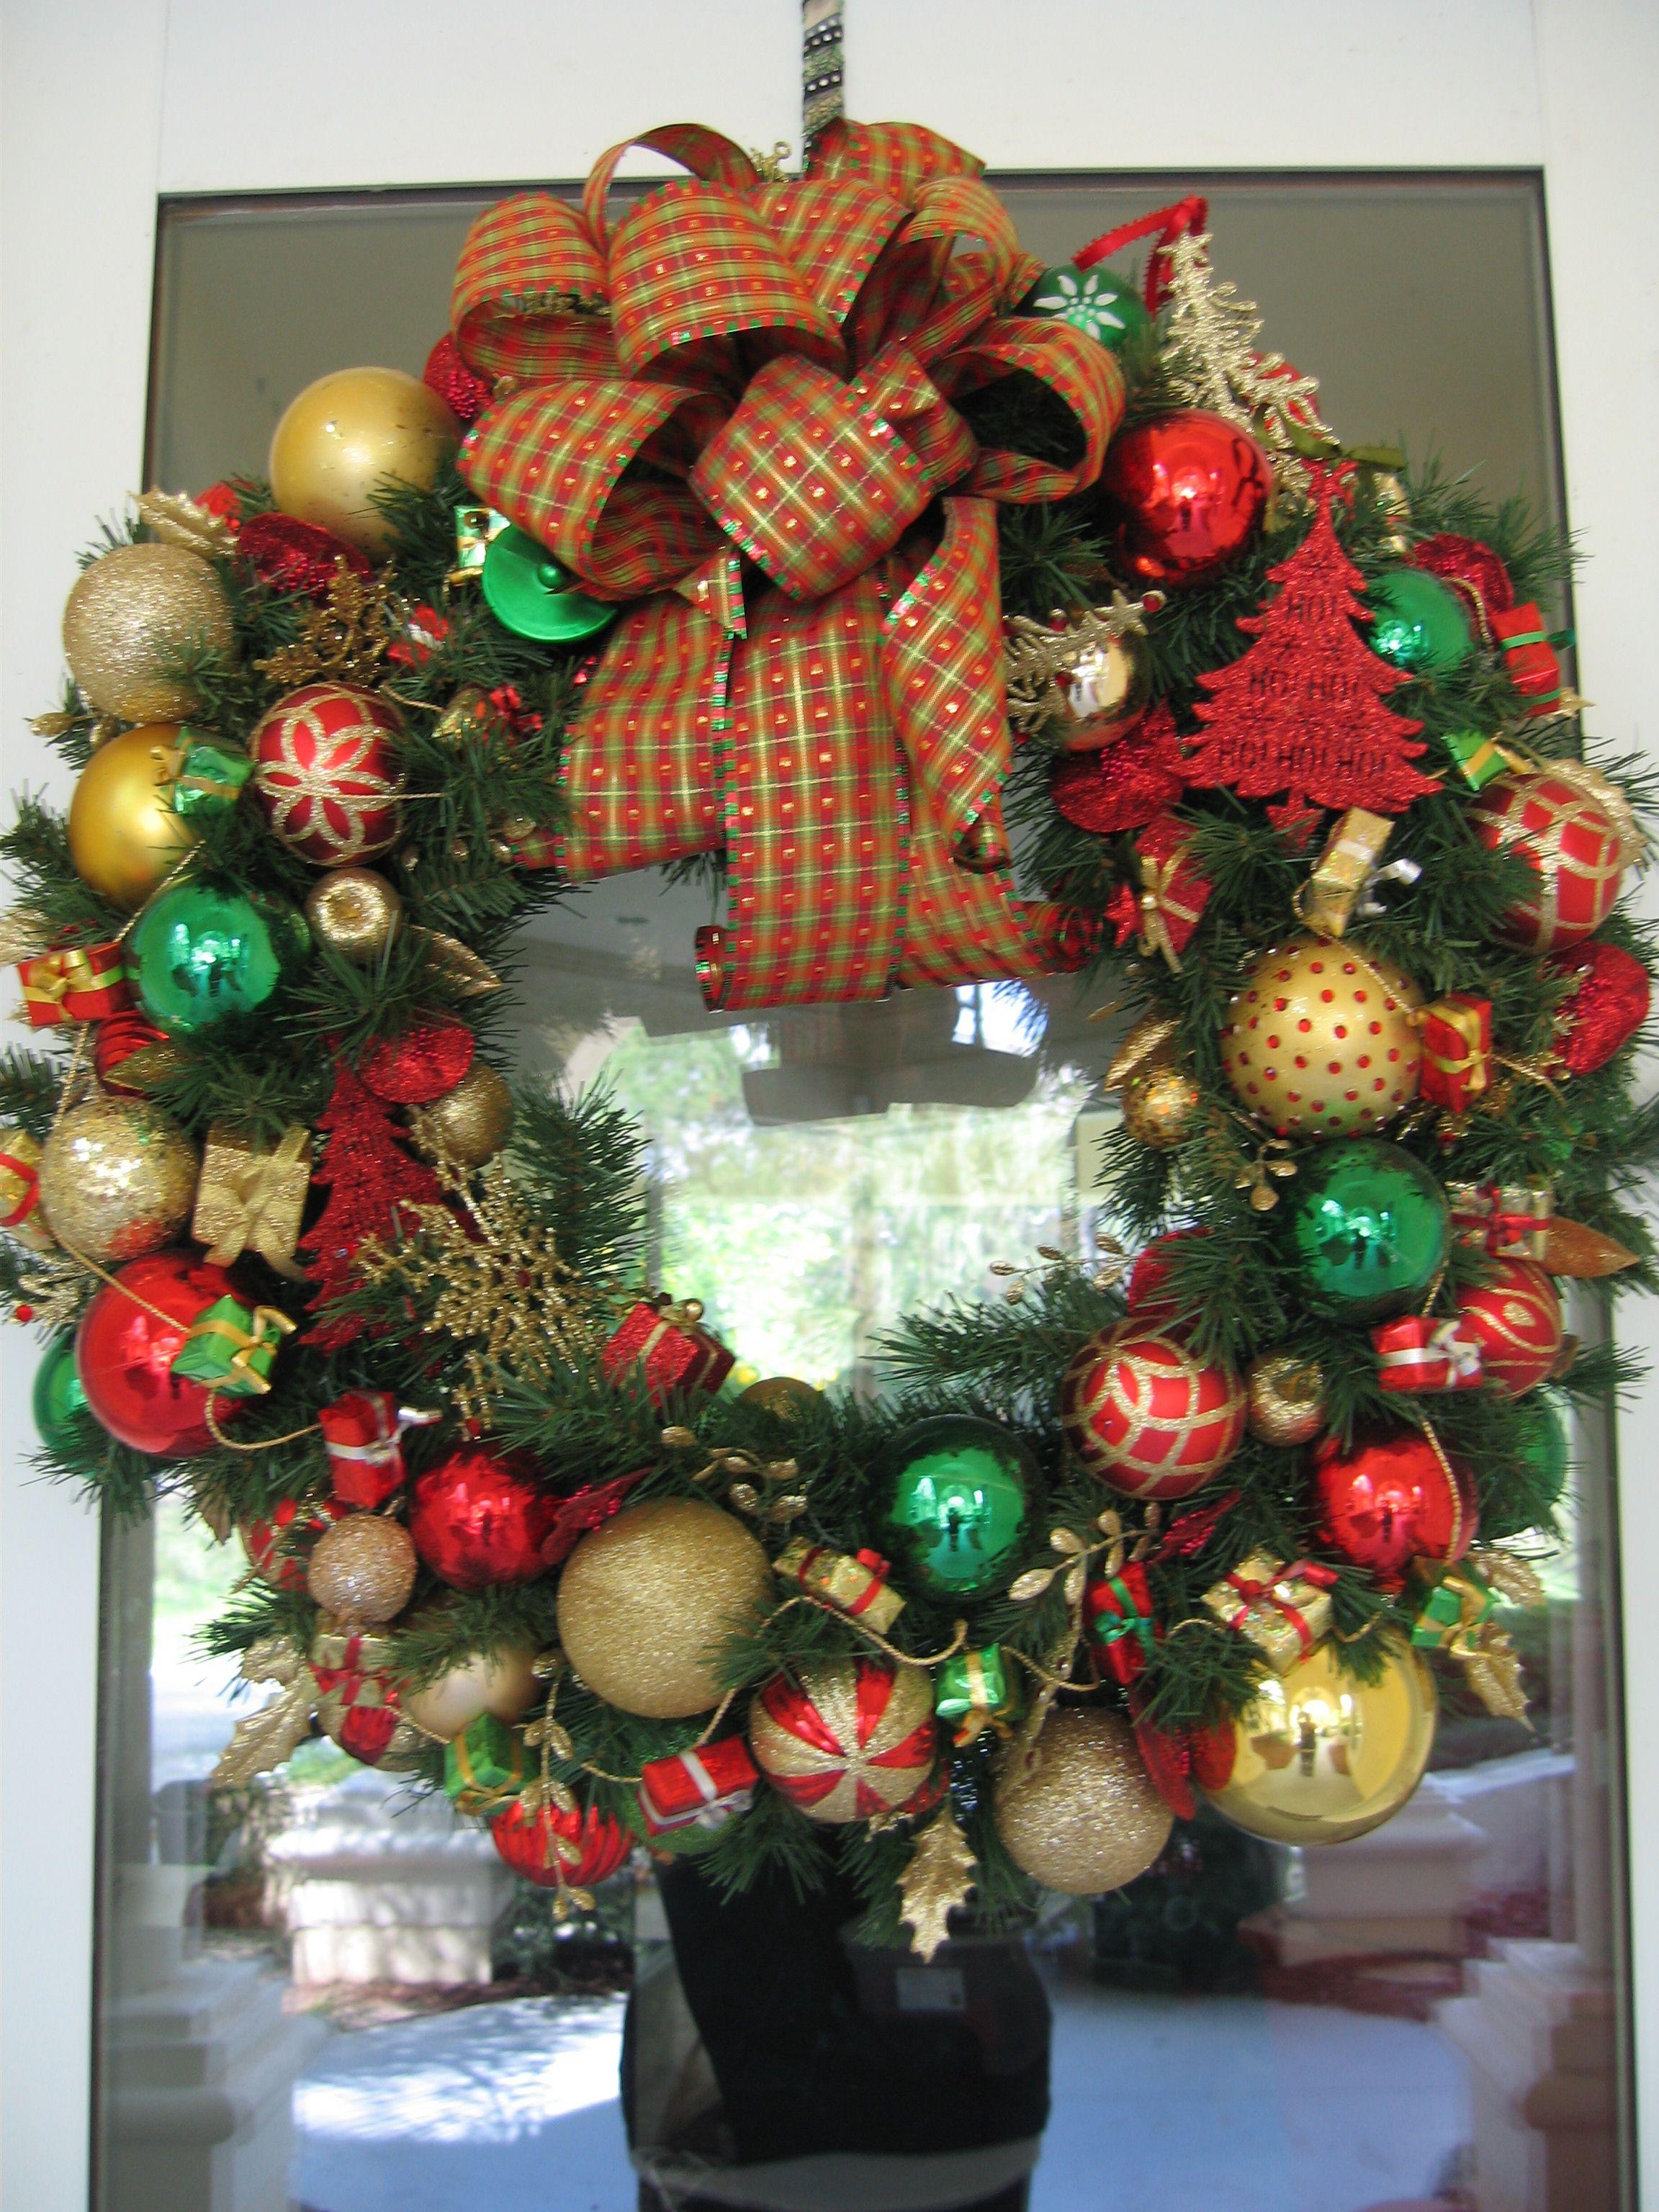 Christmas Wreath~Wreaths by Michelle on Facebook